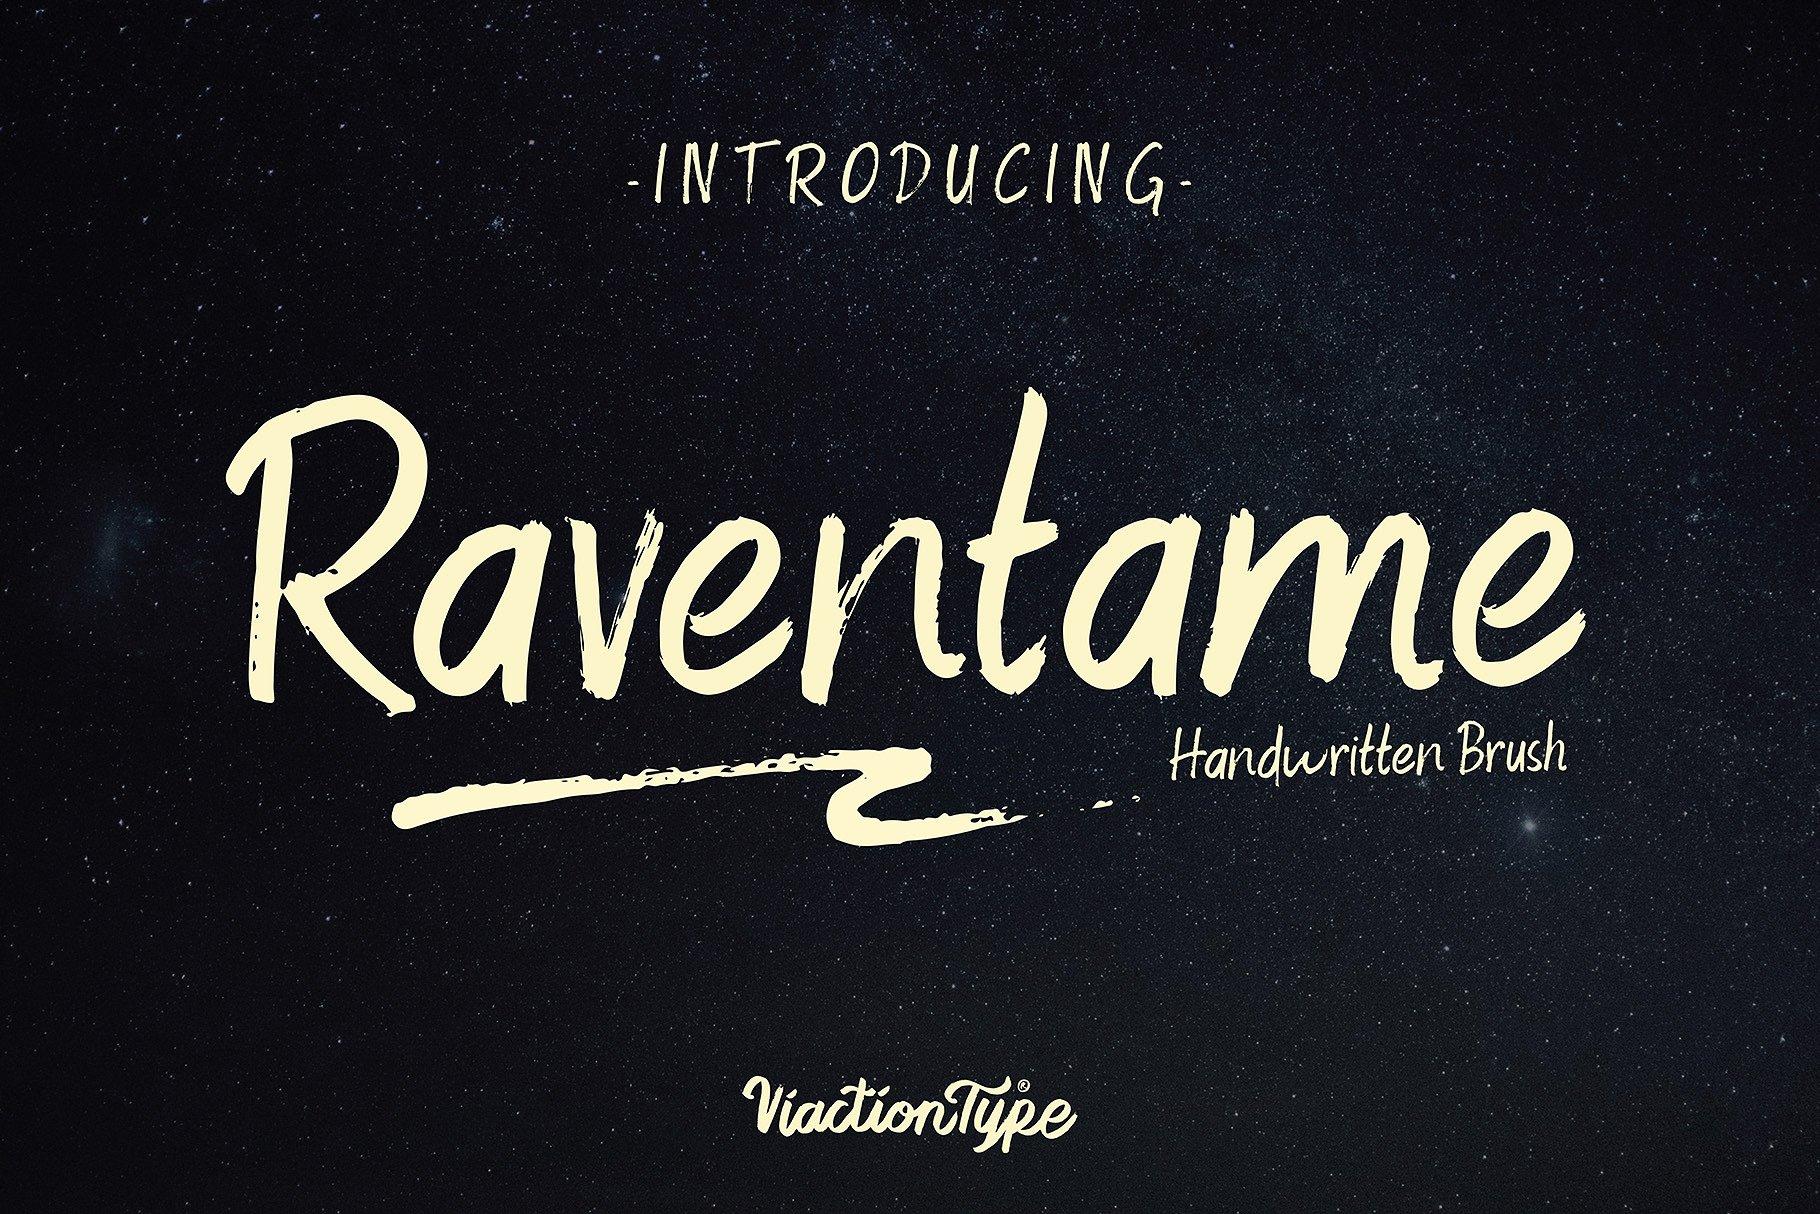 Raventame手写手绘英文字体下载